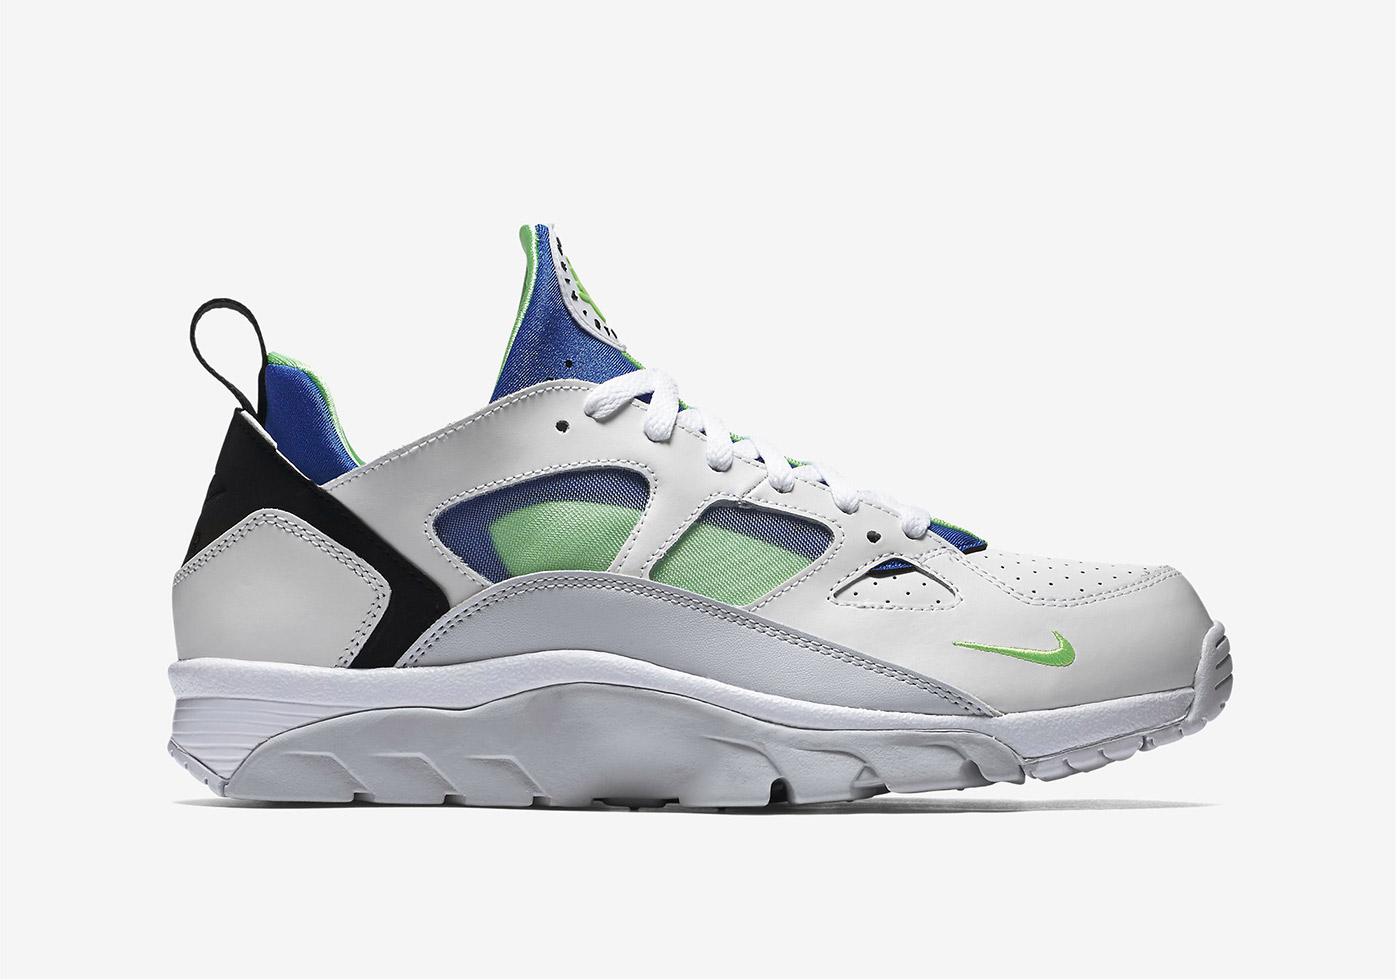 288053997e729 Nike Air Vapormax Flyknit White Rainbow Free Shoe | Portal For Tenders